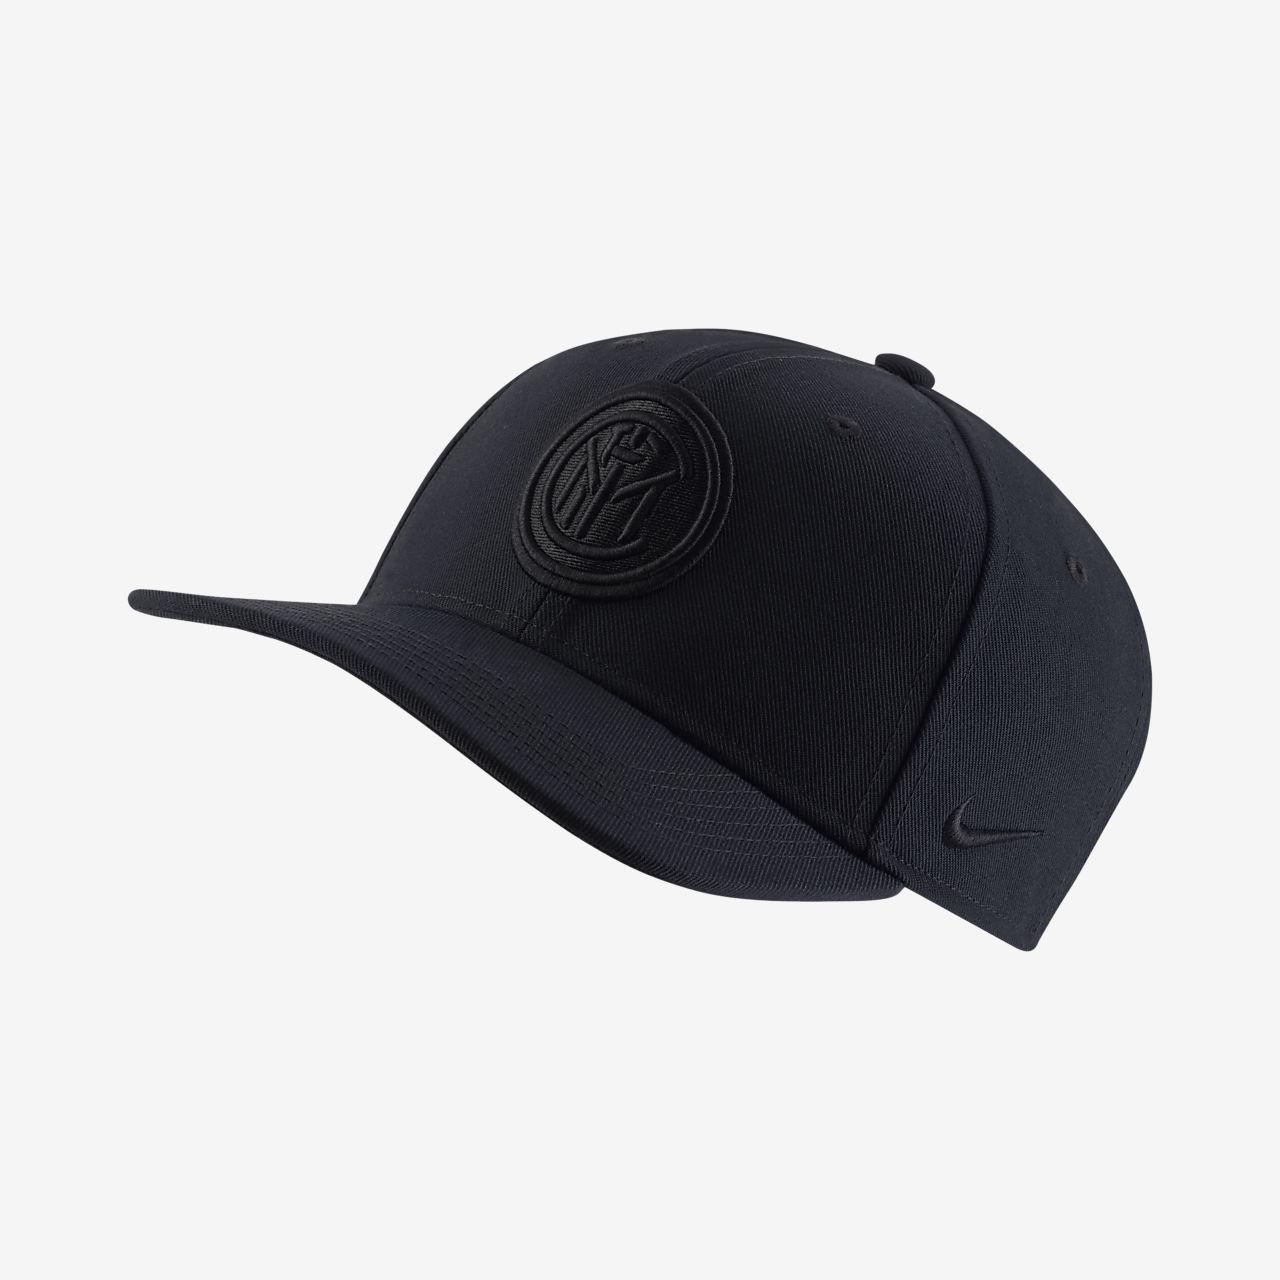 Nike Pro Inter Milan Older Kids' Adjustable Hat